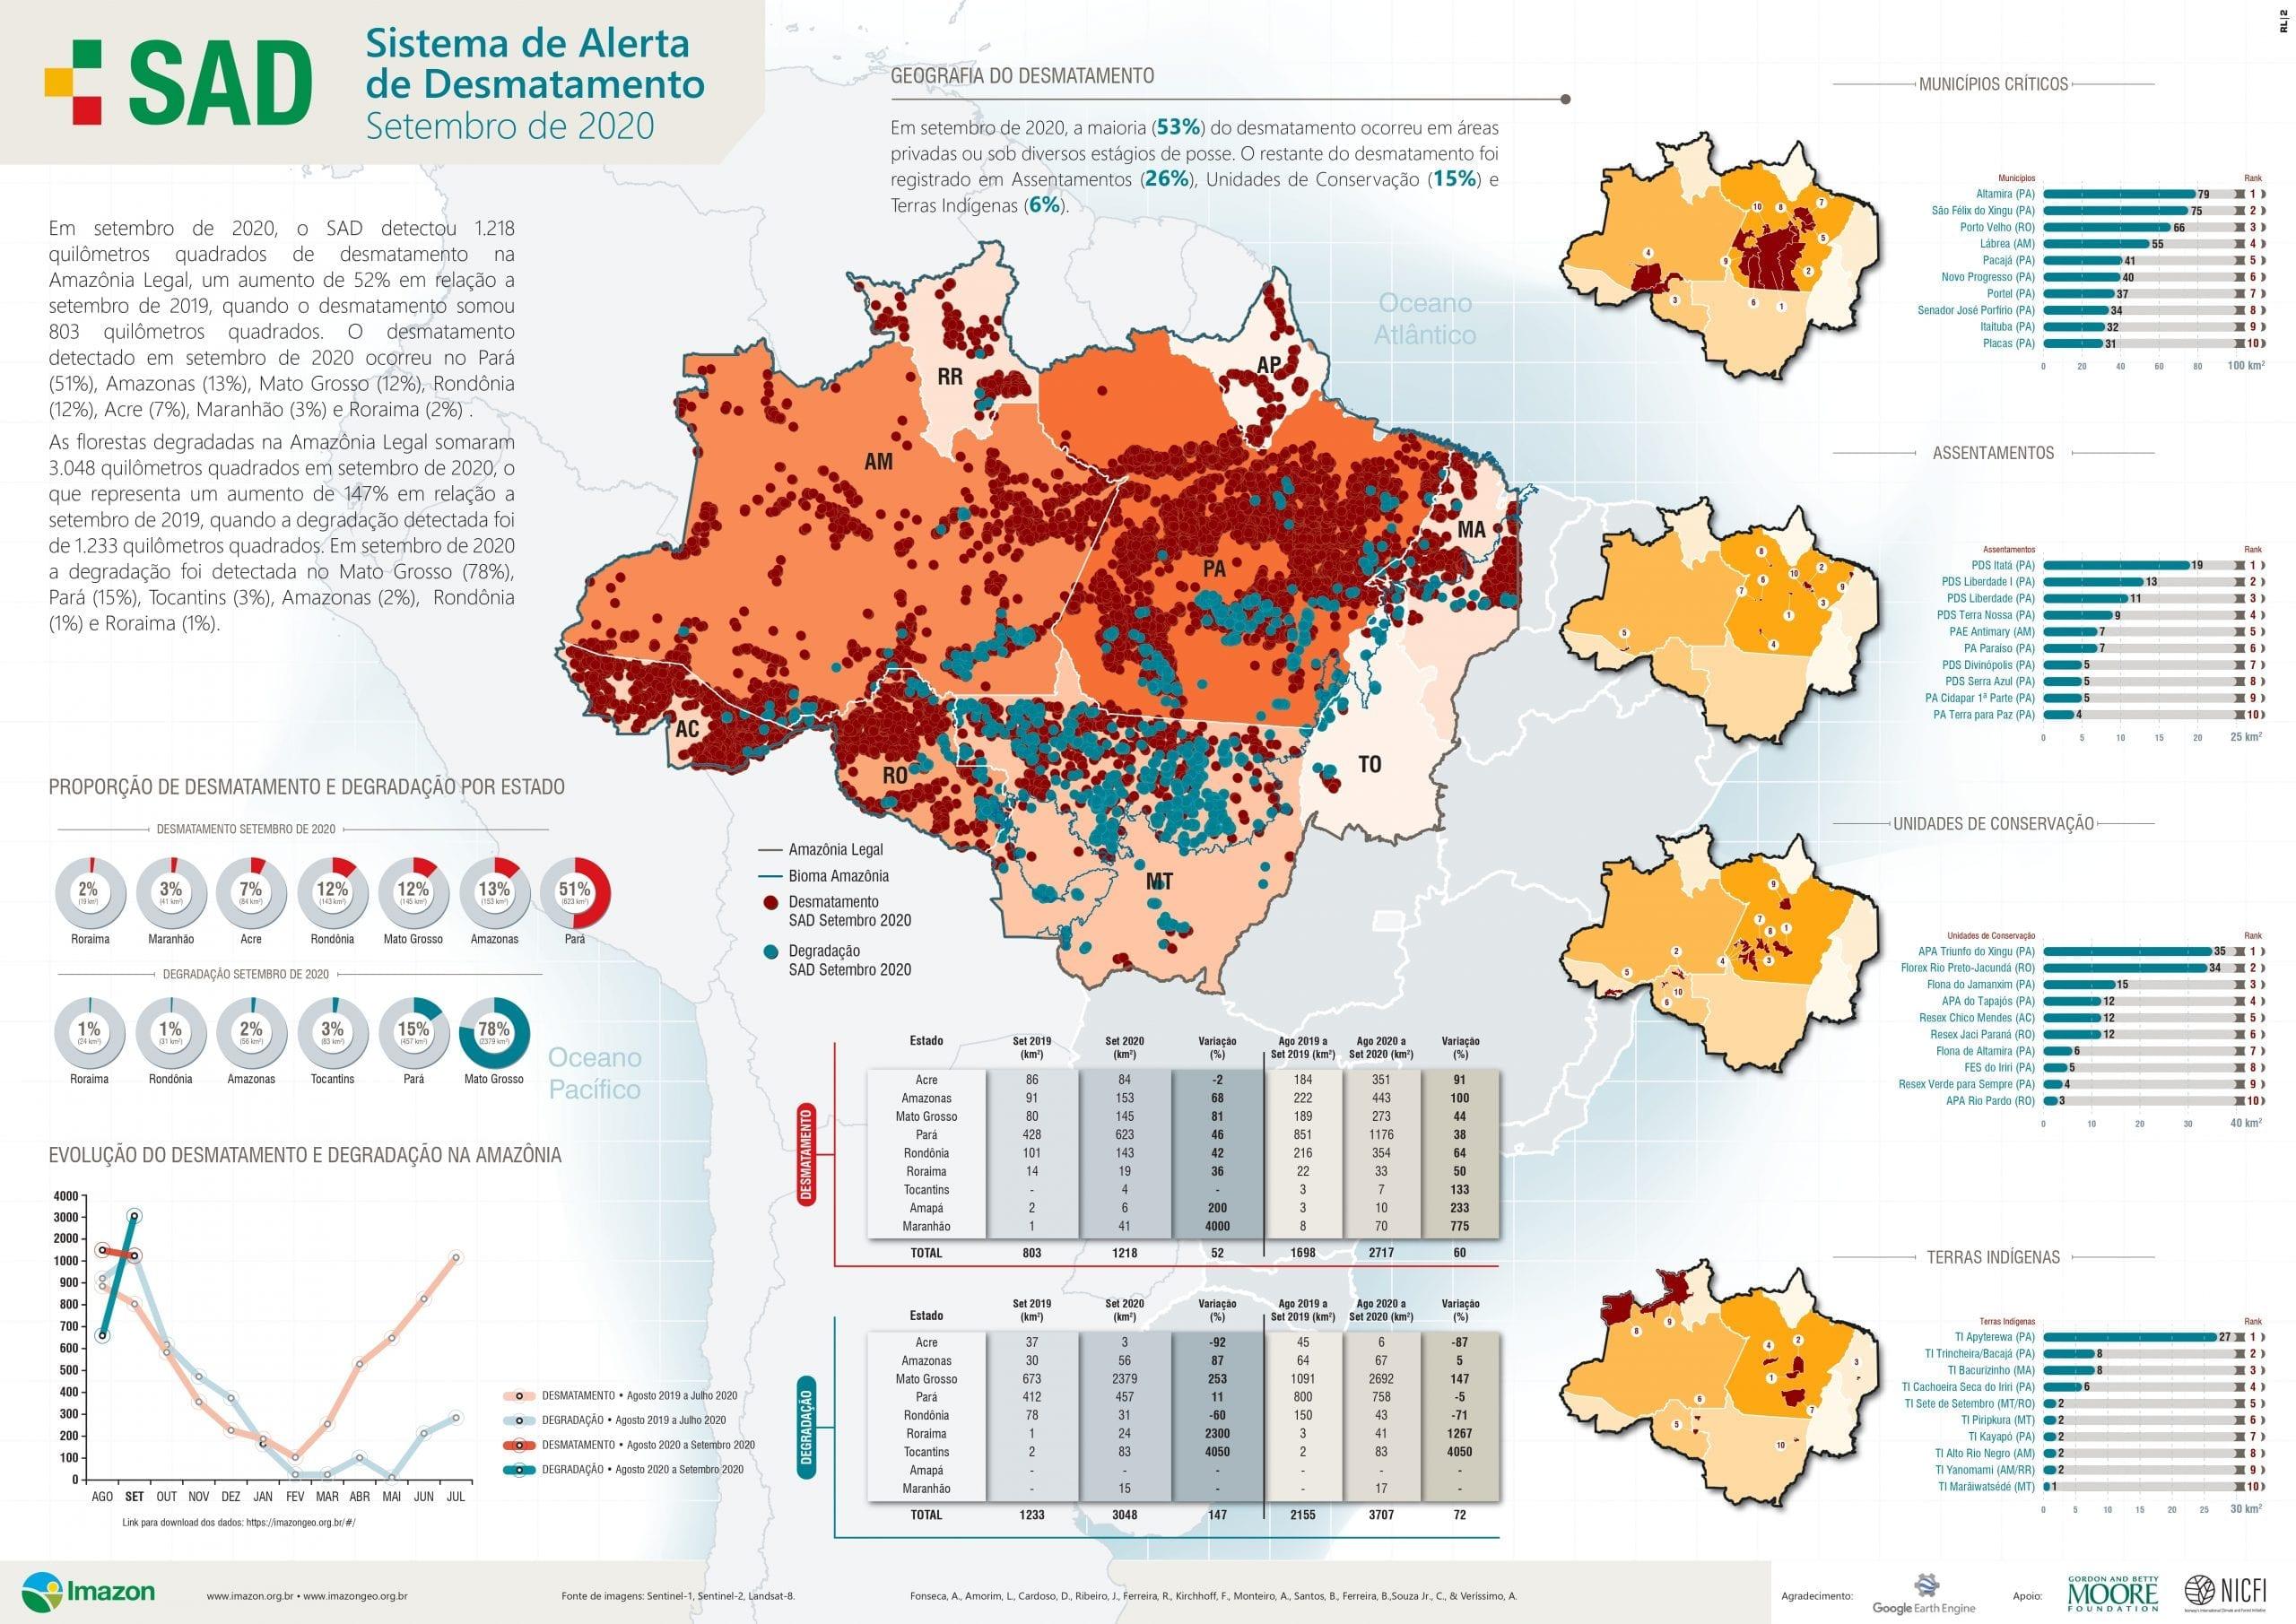 SAD Setembro scaled - Boletim do Desmatamento da Amazônia Legal (setembro 2020) SAD